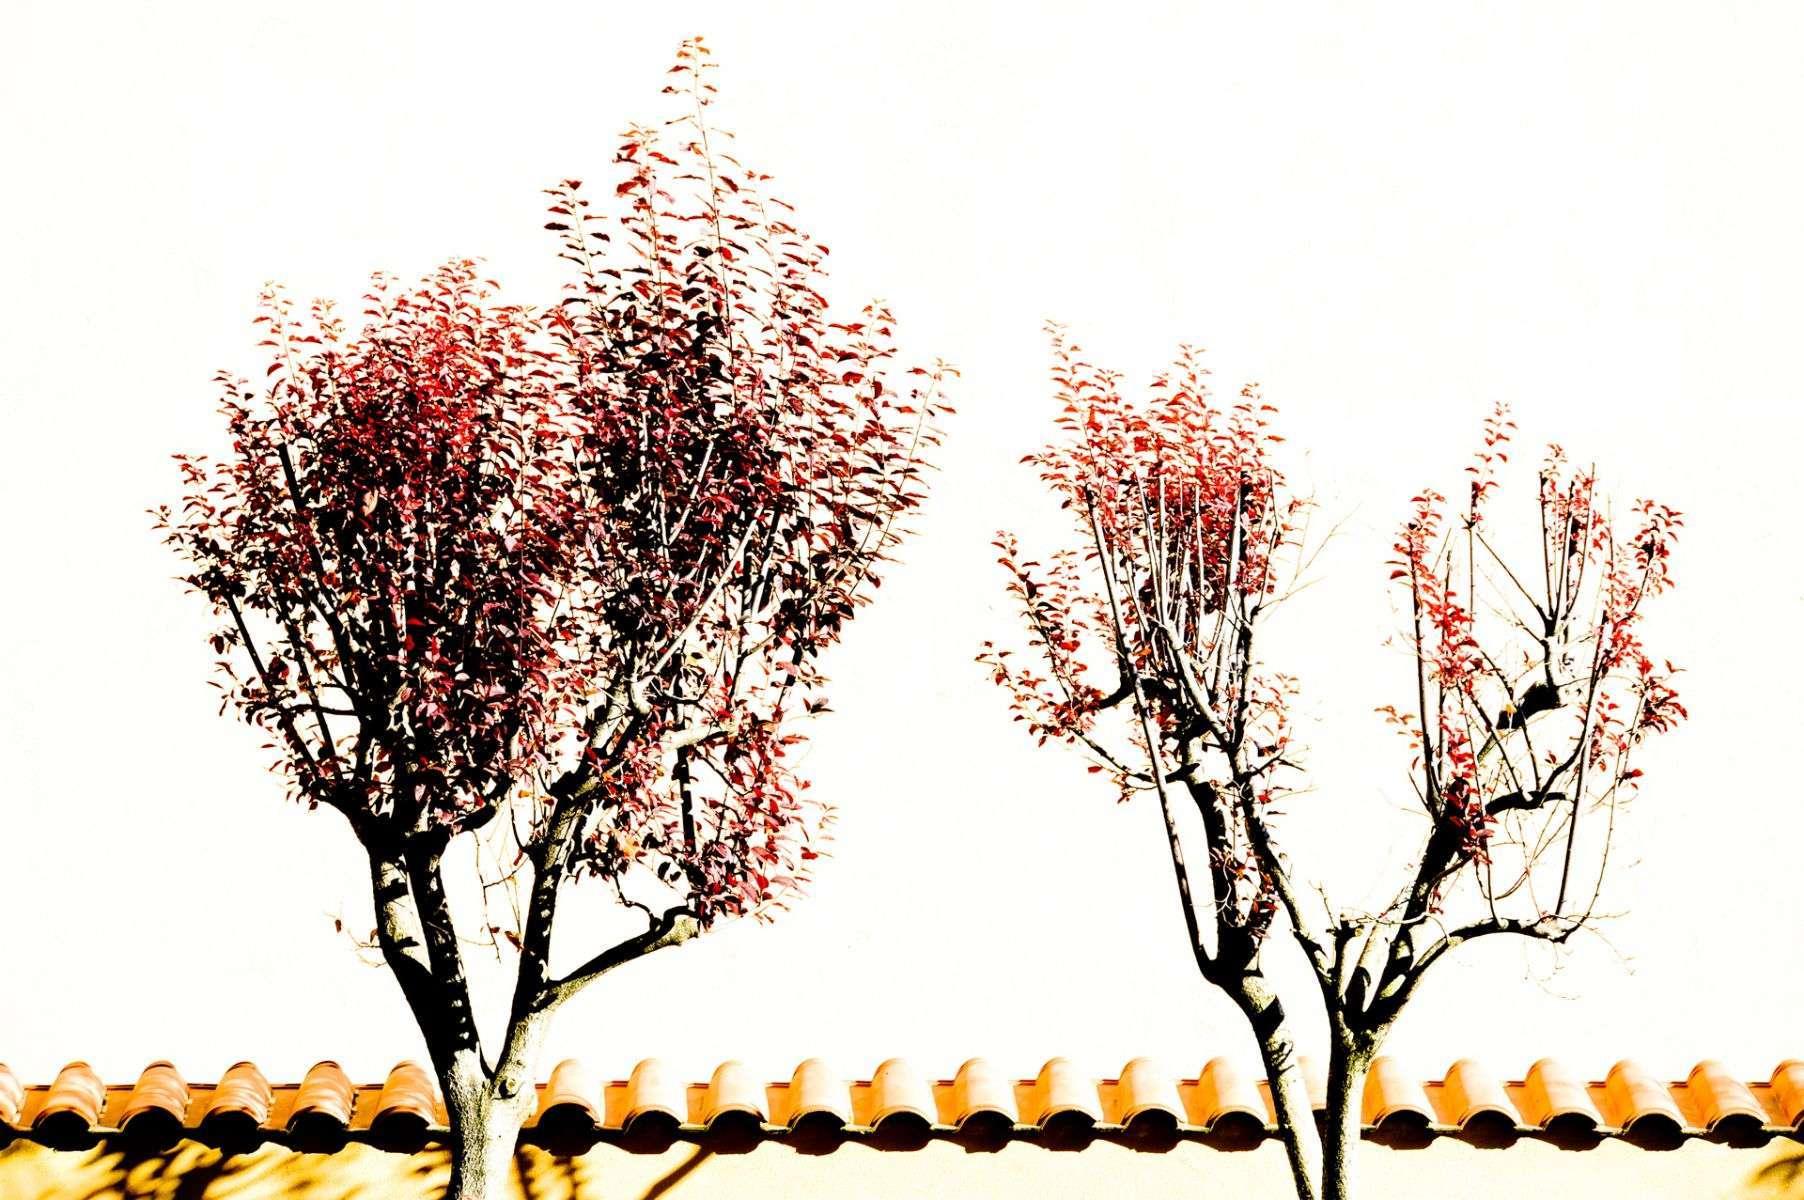 TREE_copymrlukkor